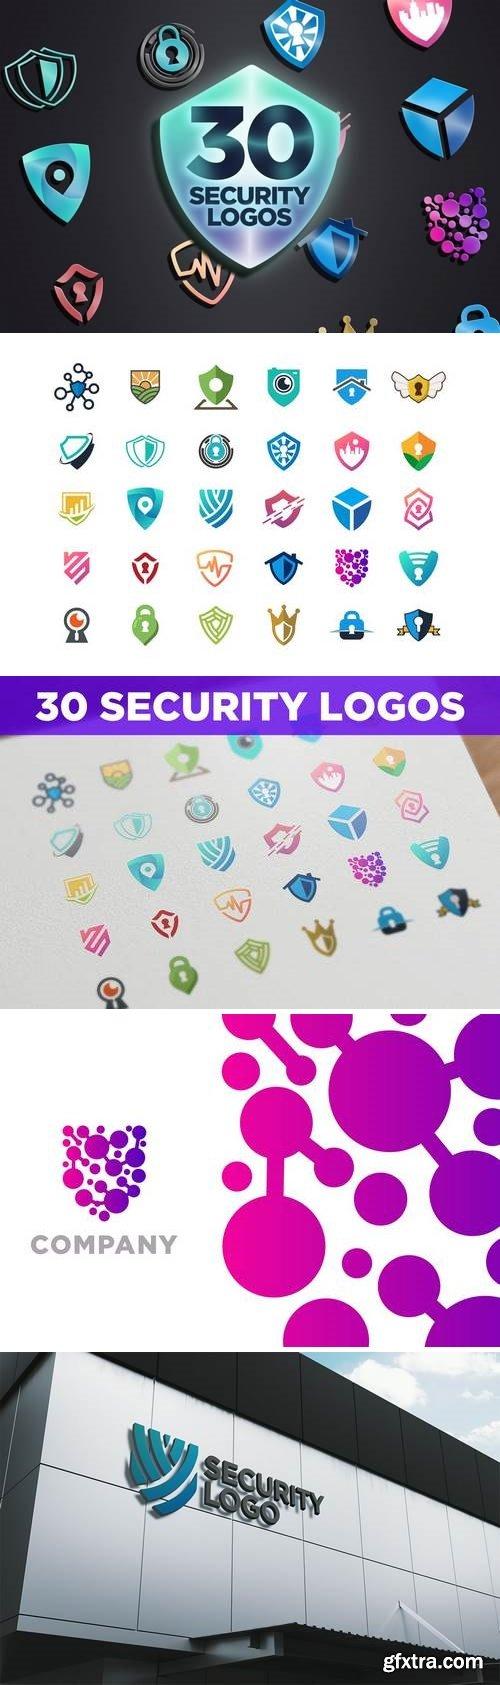 30 Modern Security Logos